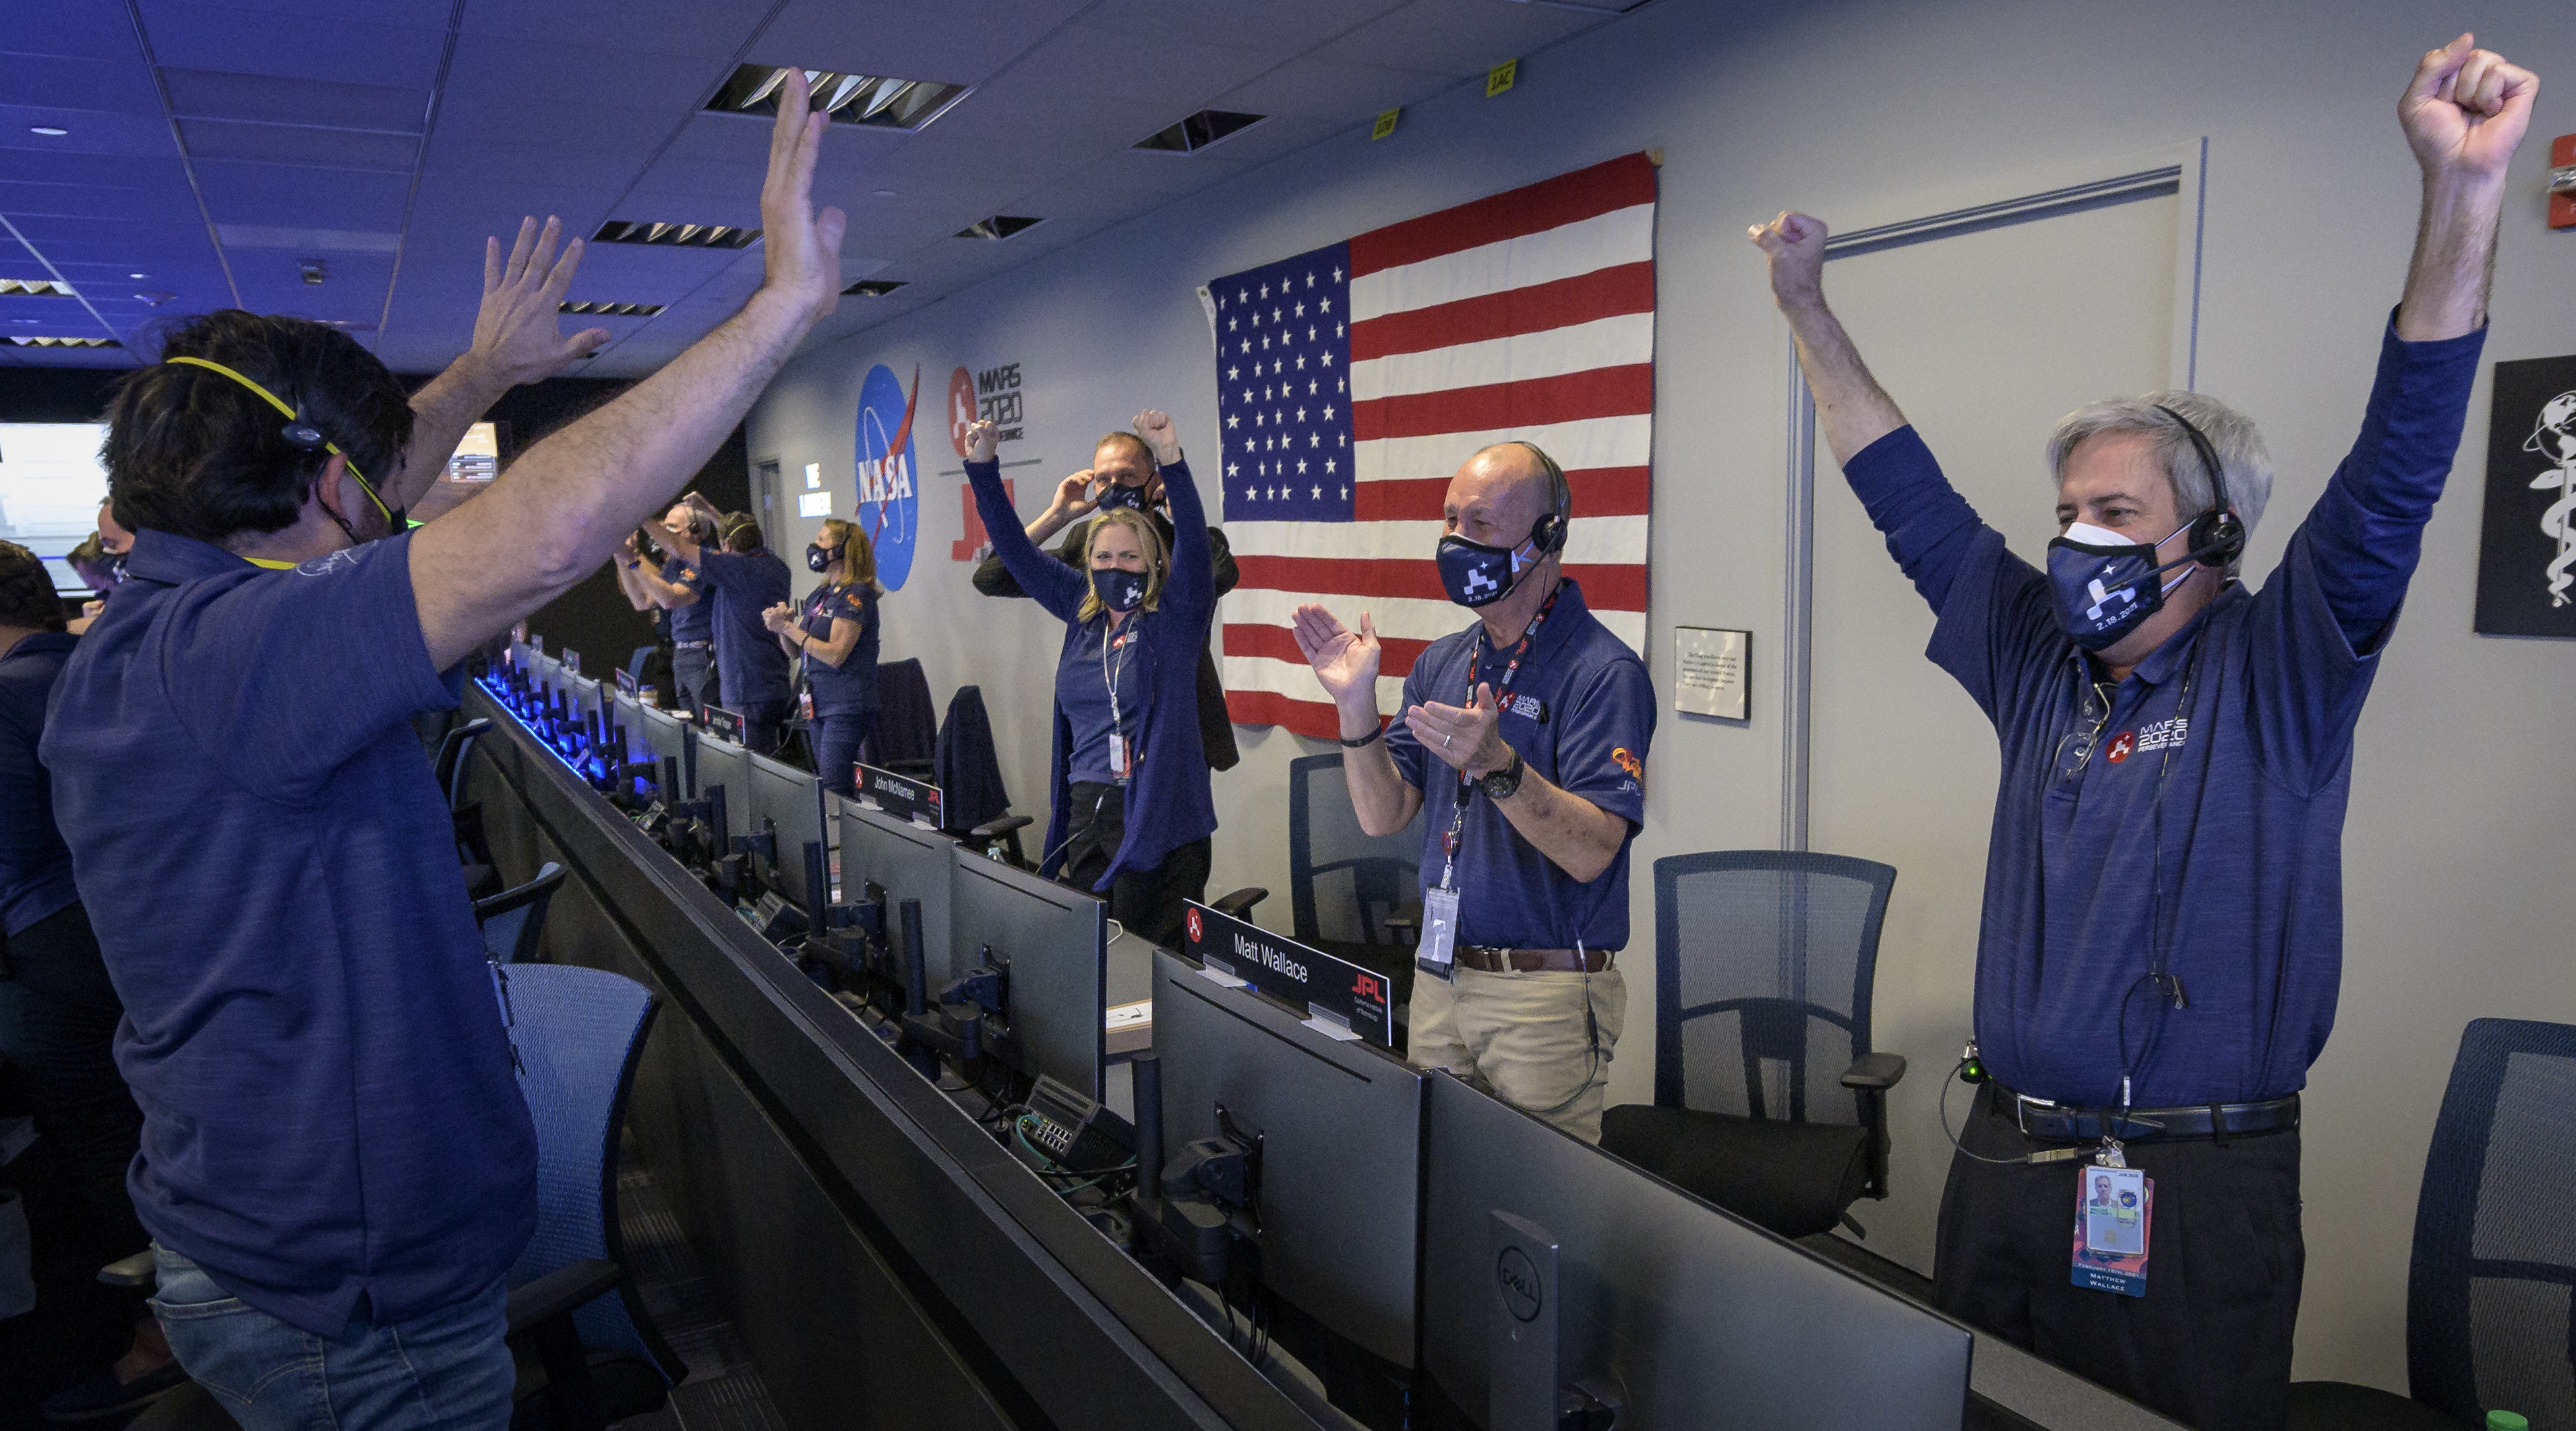 Bill Ingalls/NASA